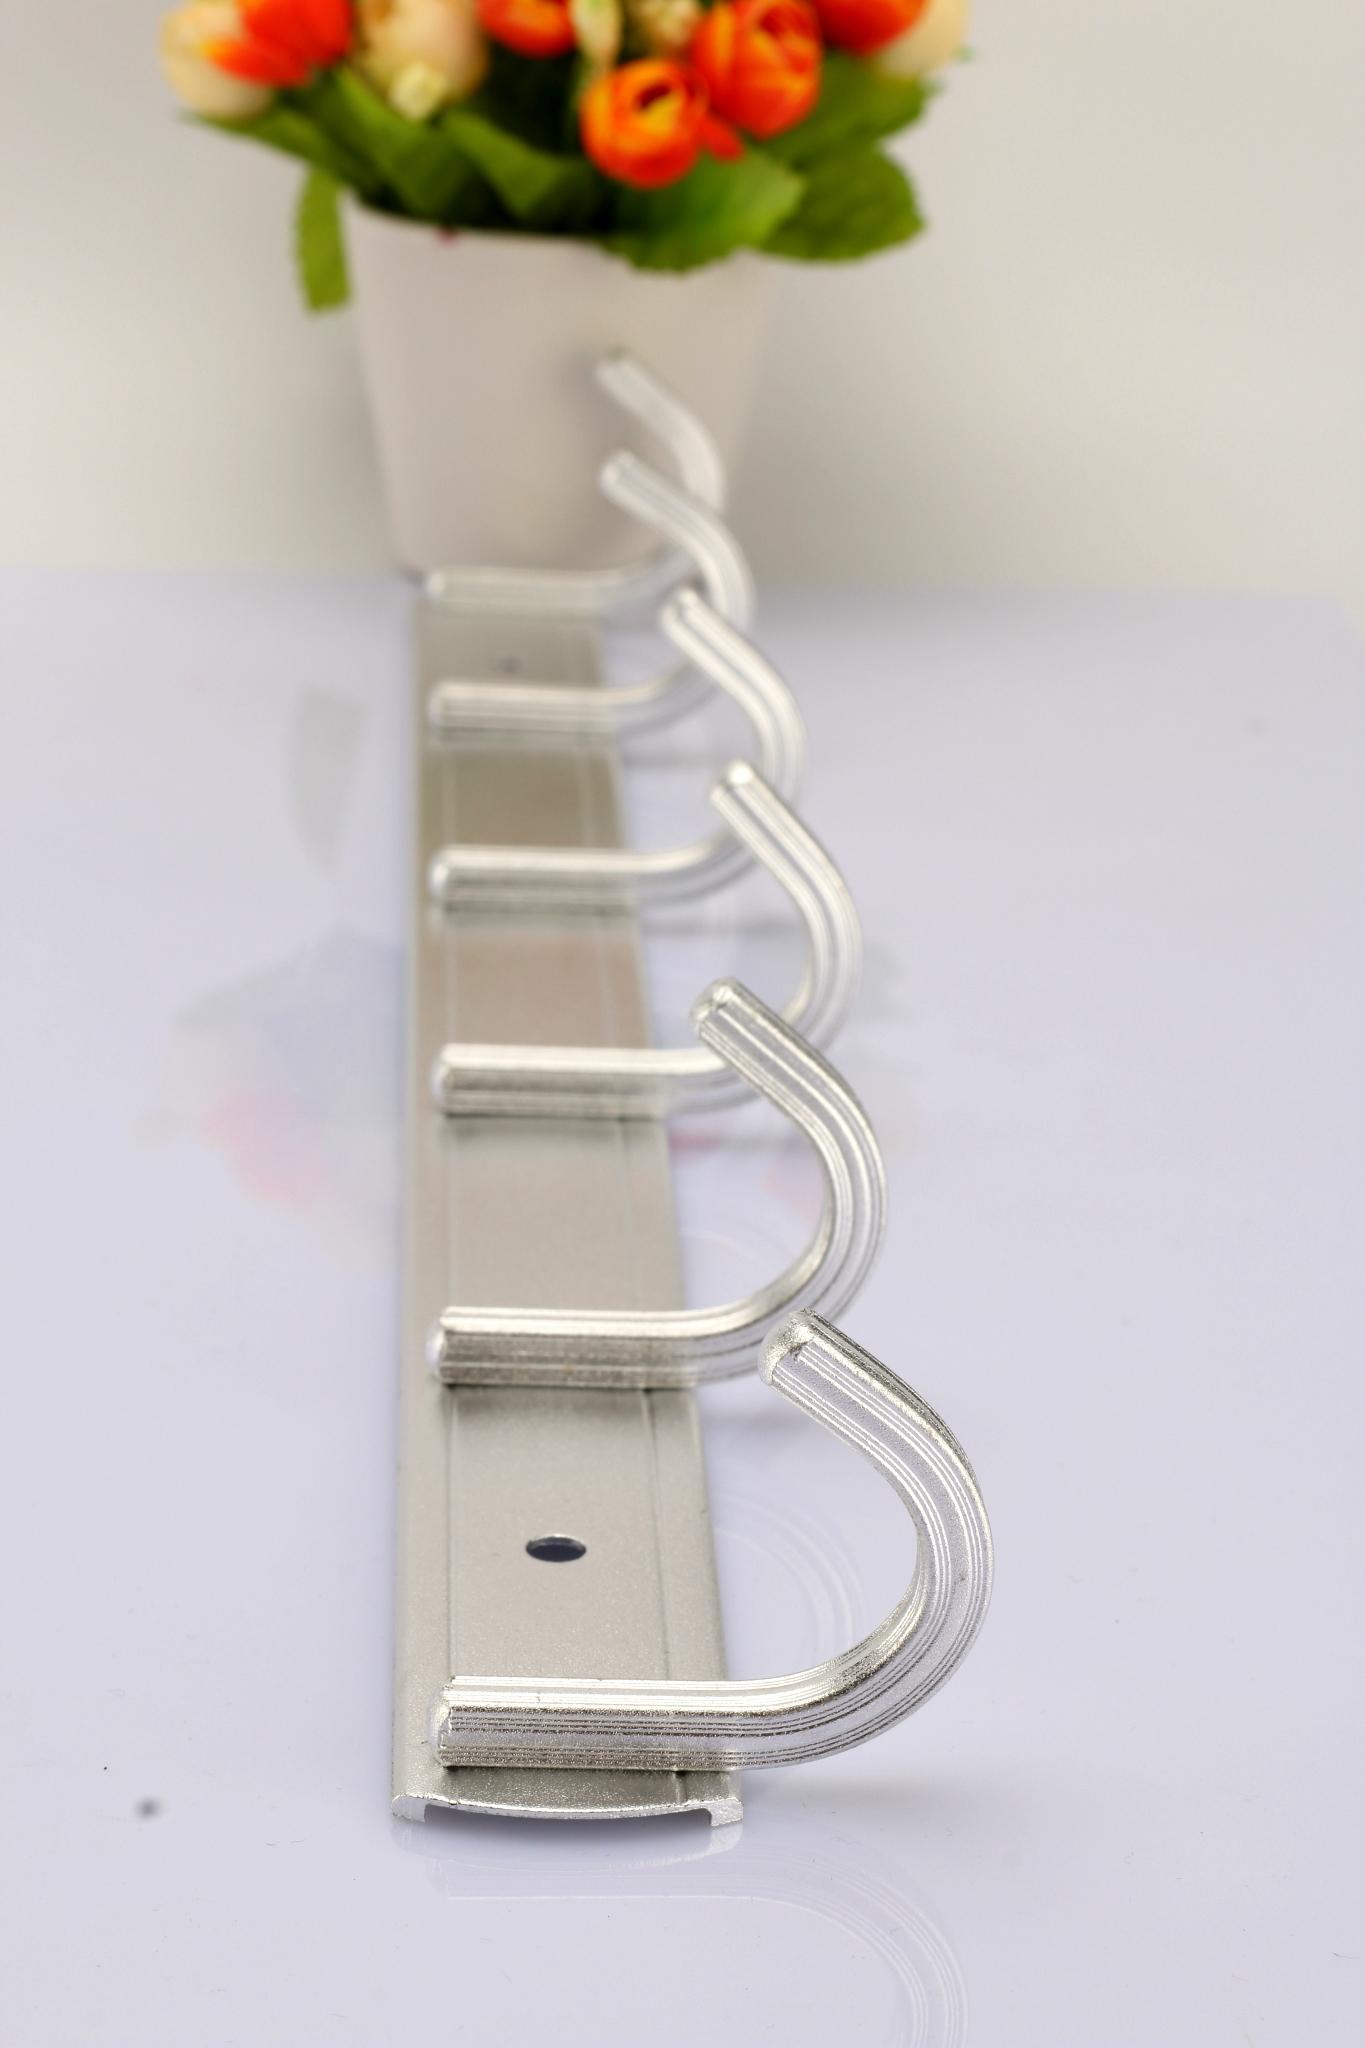 Factory direct space aluminum wall coat hook hook hook hook / practical towel 4